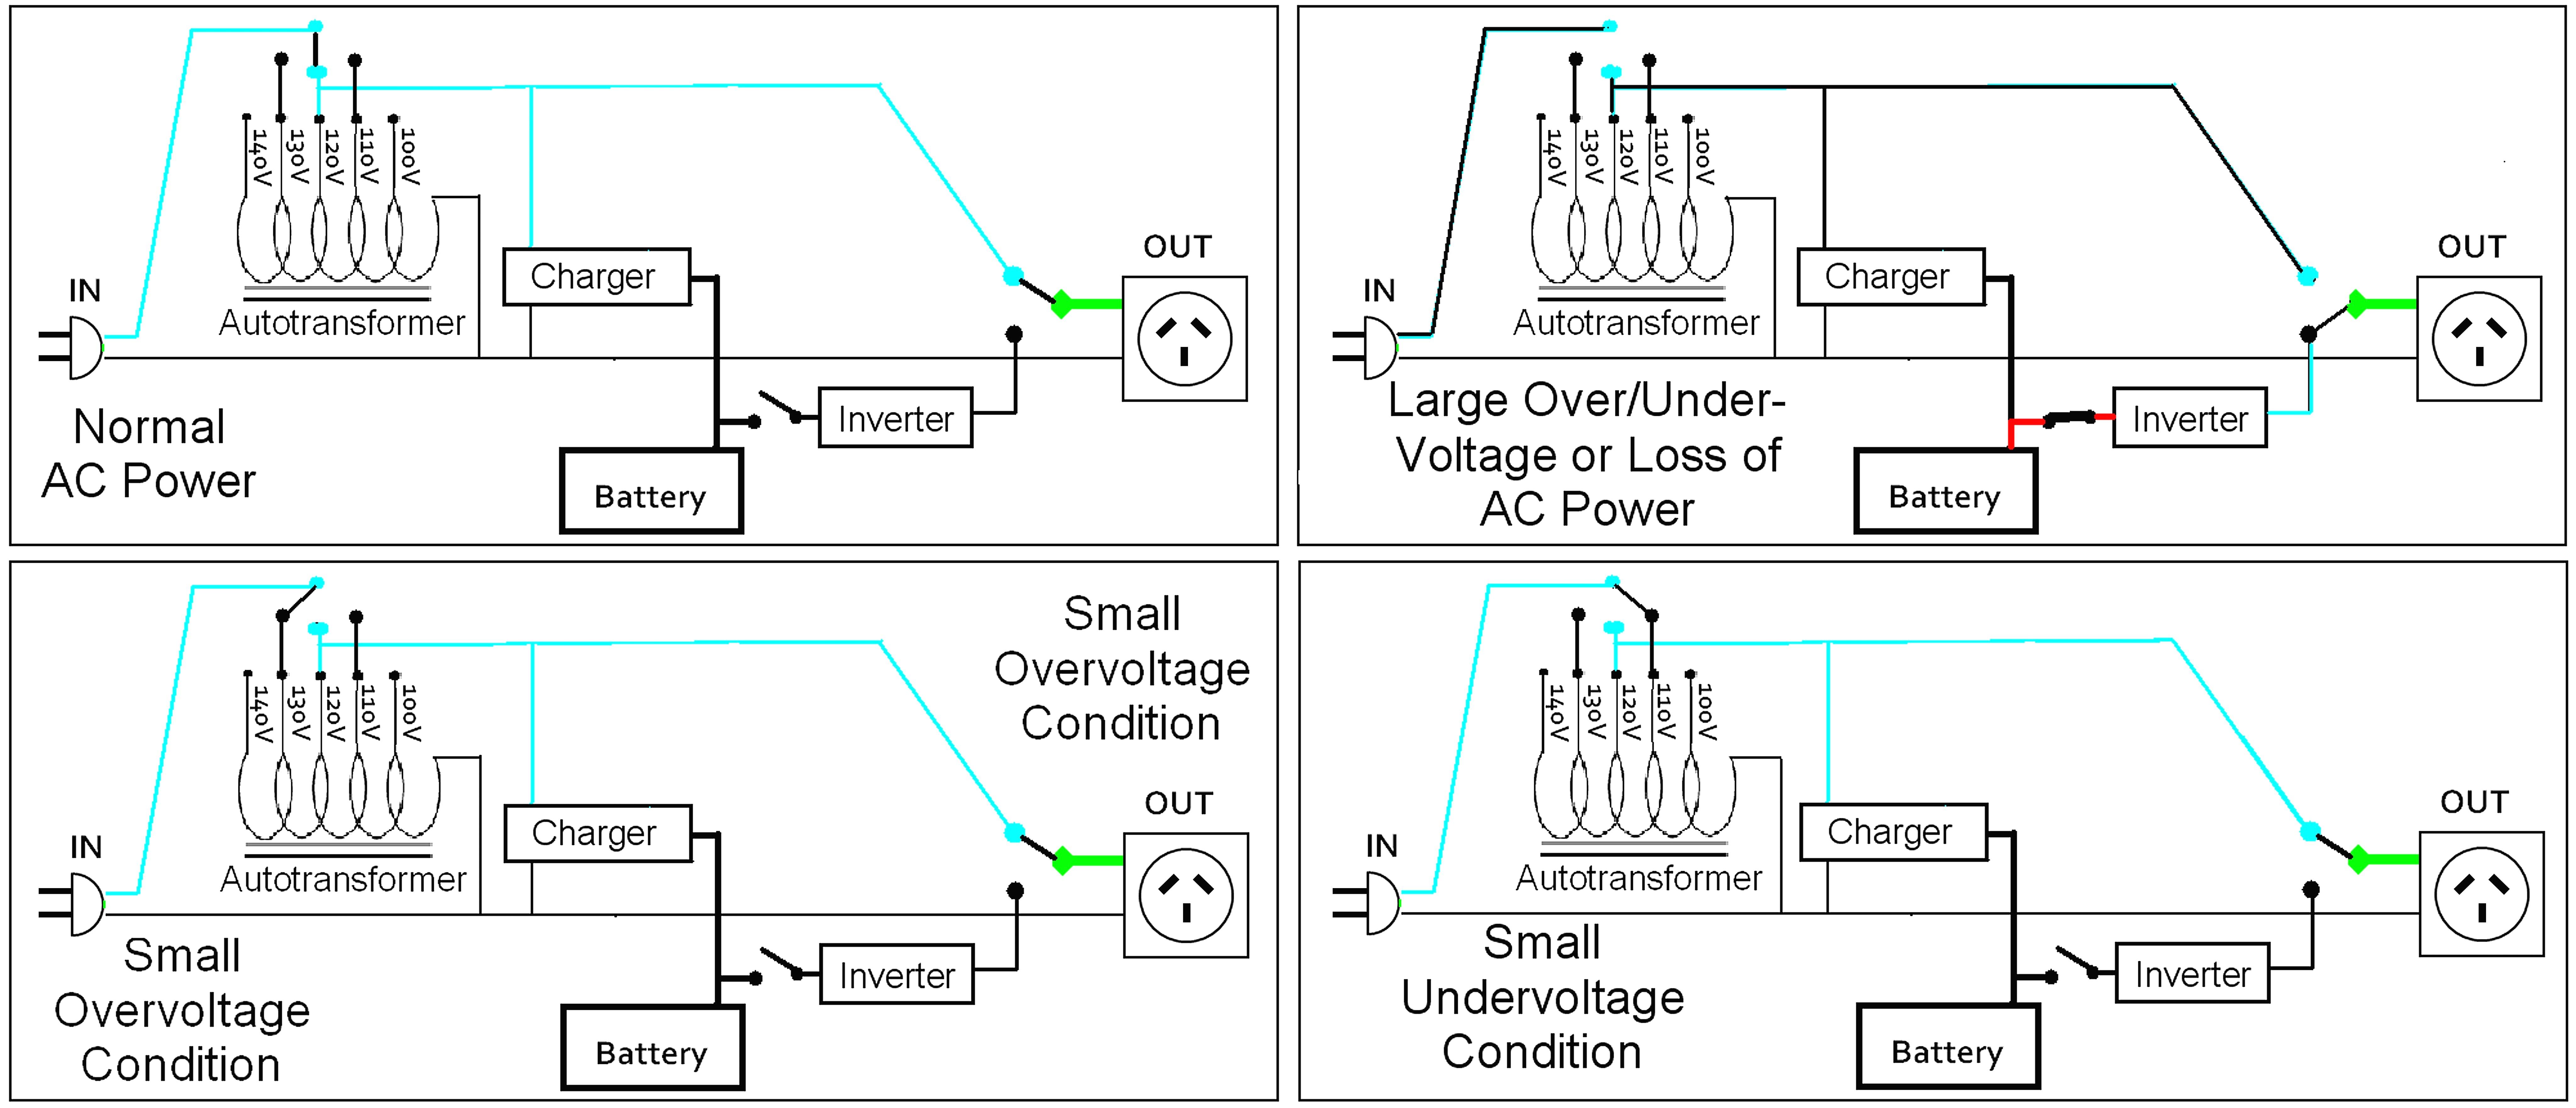 ge buck boost transformer wiring diagram Collection-Acme Buck Boost Transformer Wiring Diagram Lovely Carlplant Bright At Transformers Diagrams 3-t